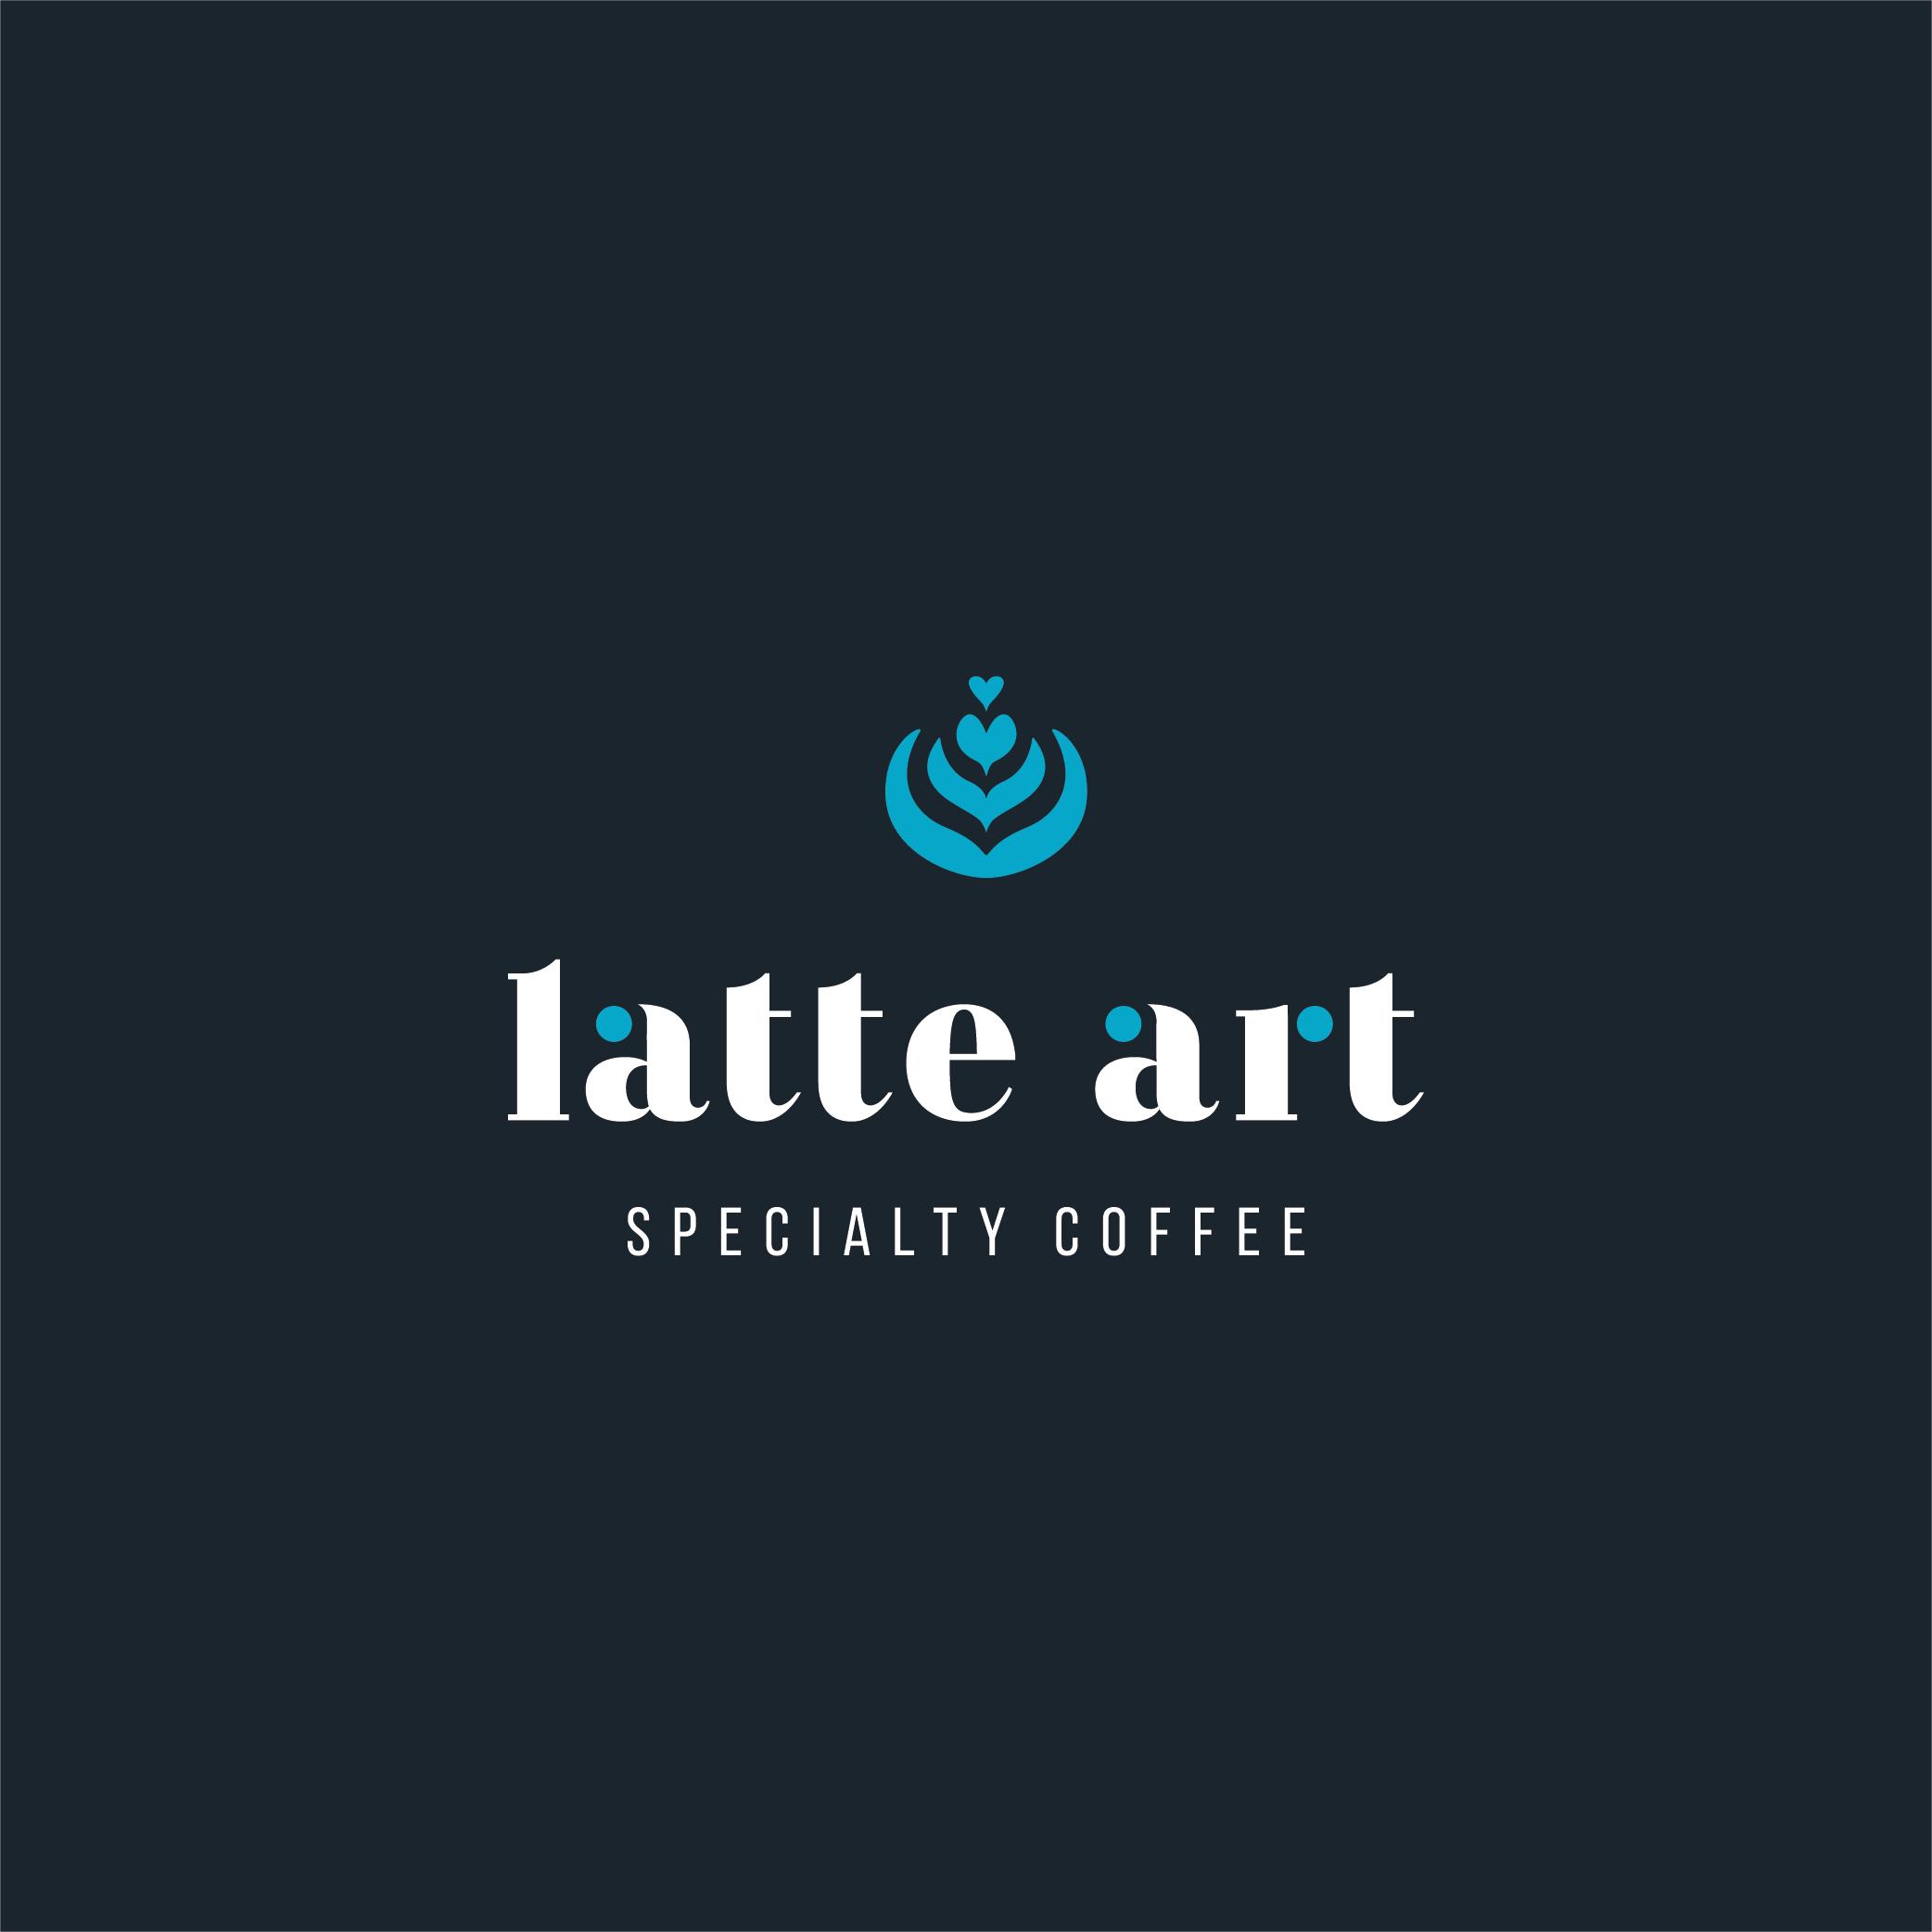 https://www.mncjobsgulf.com/company/latte-art-specialty-coffee